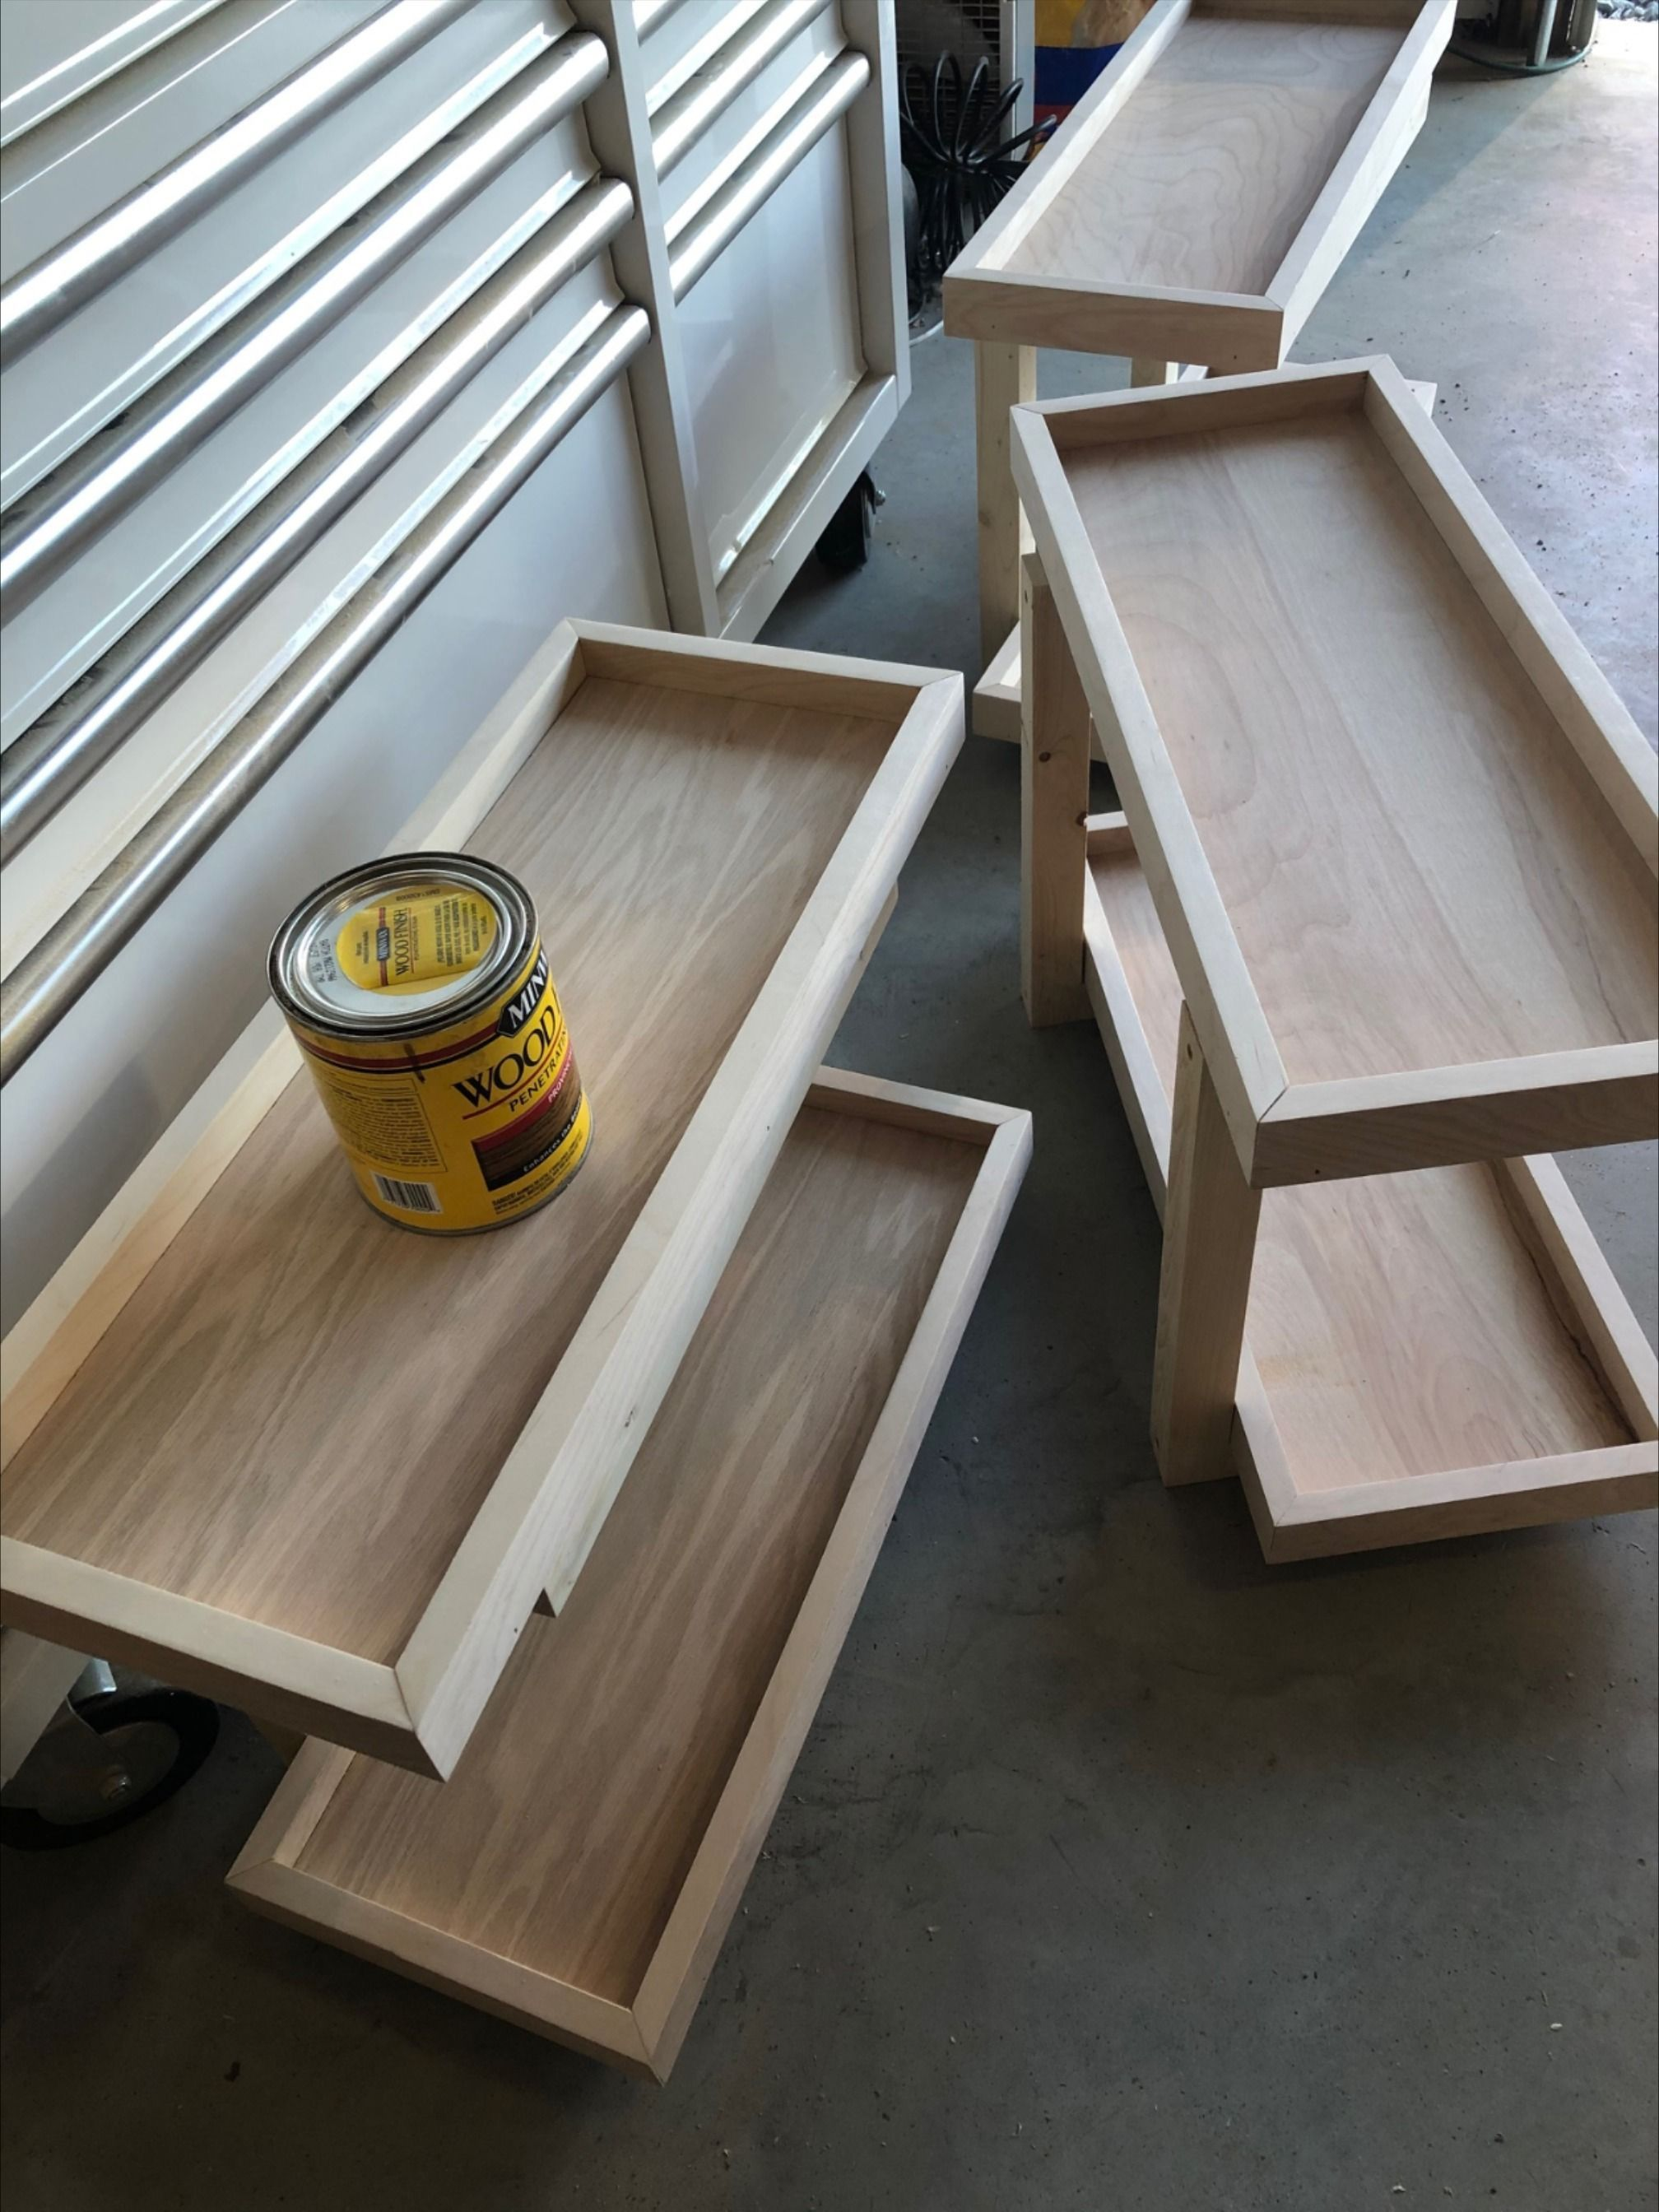 DIY Scrap Wood Wall Shelves#diy #scrap #shelves #wall #wood